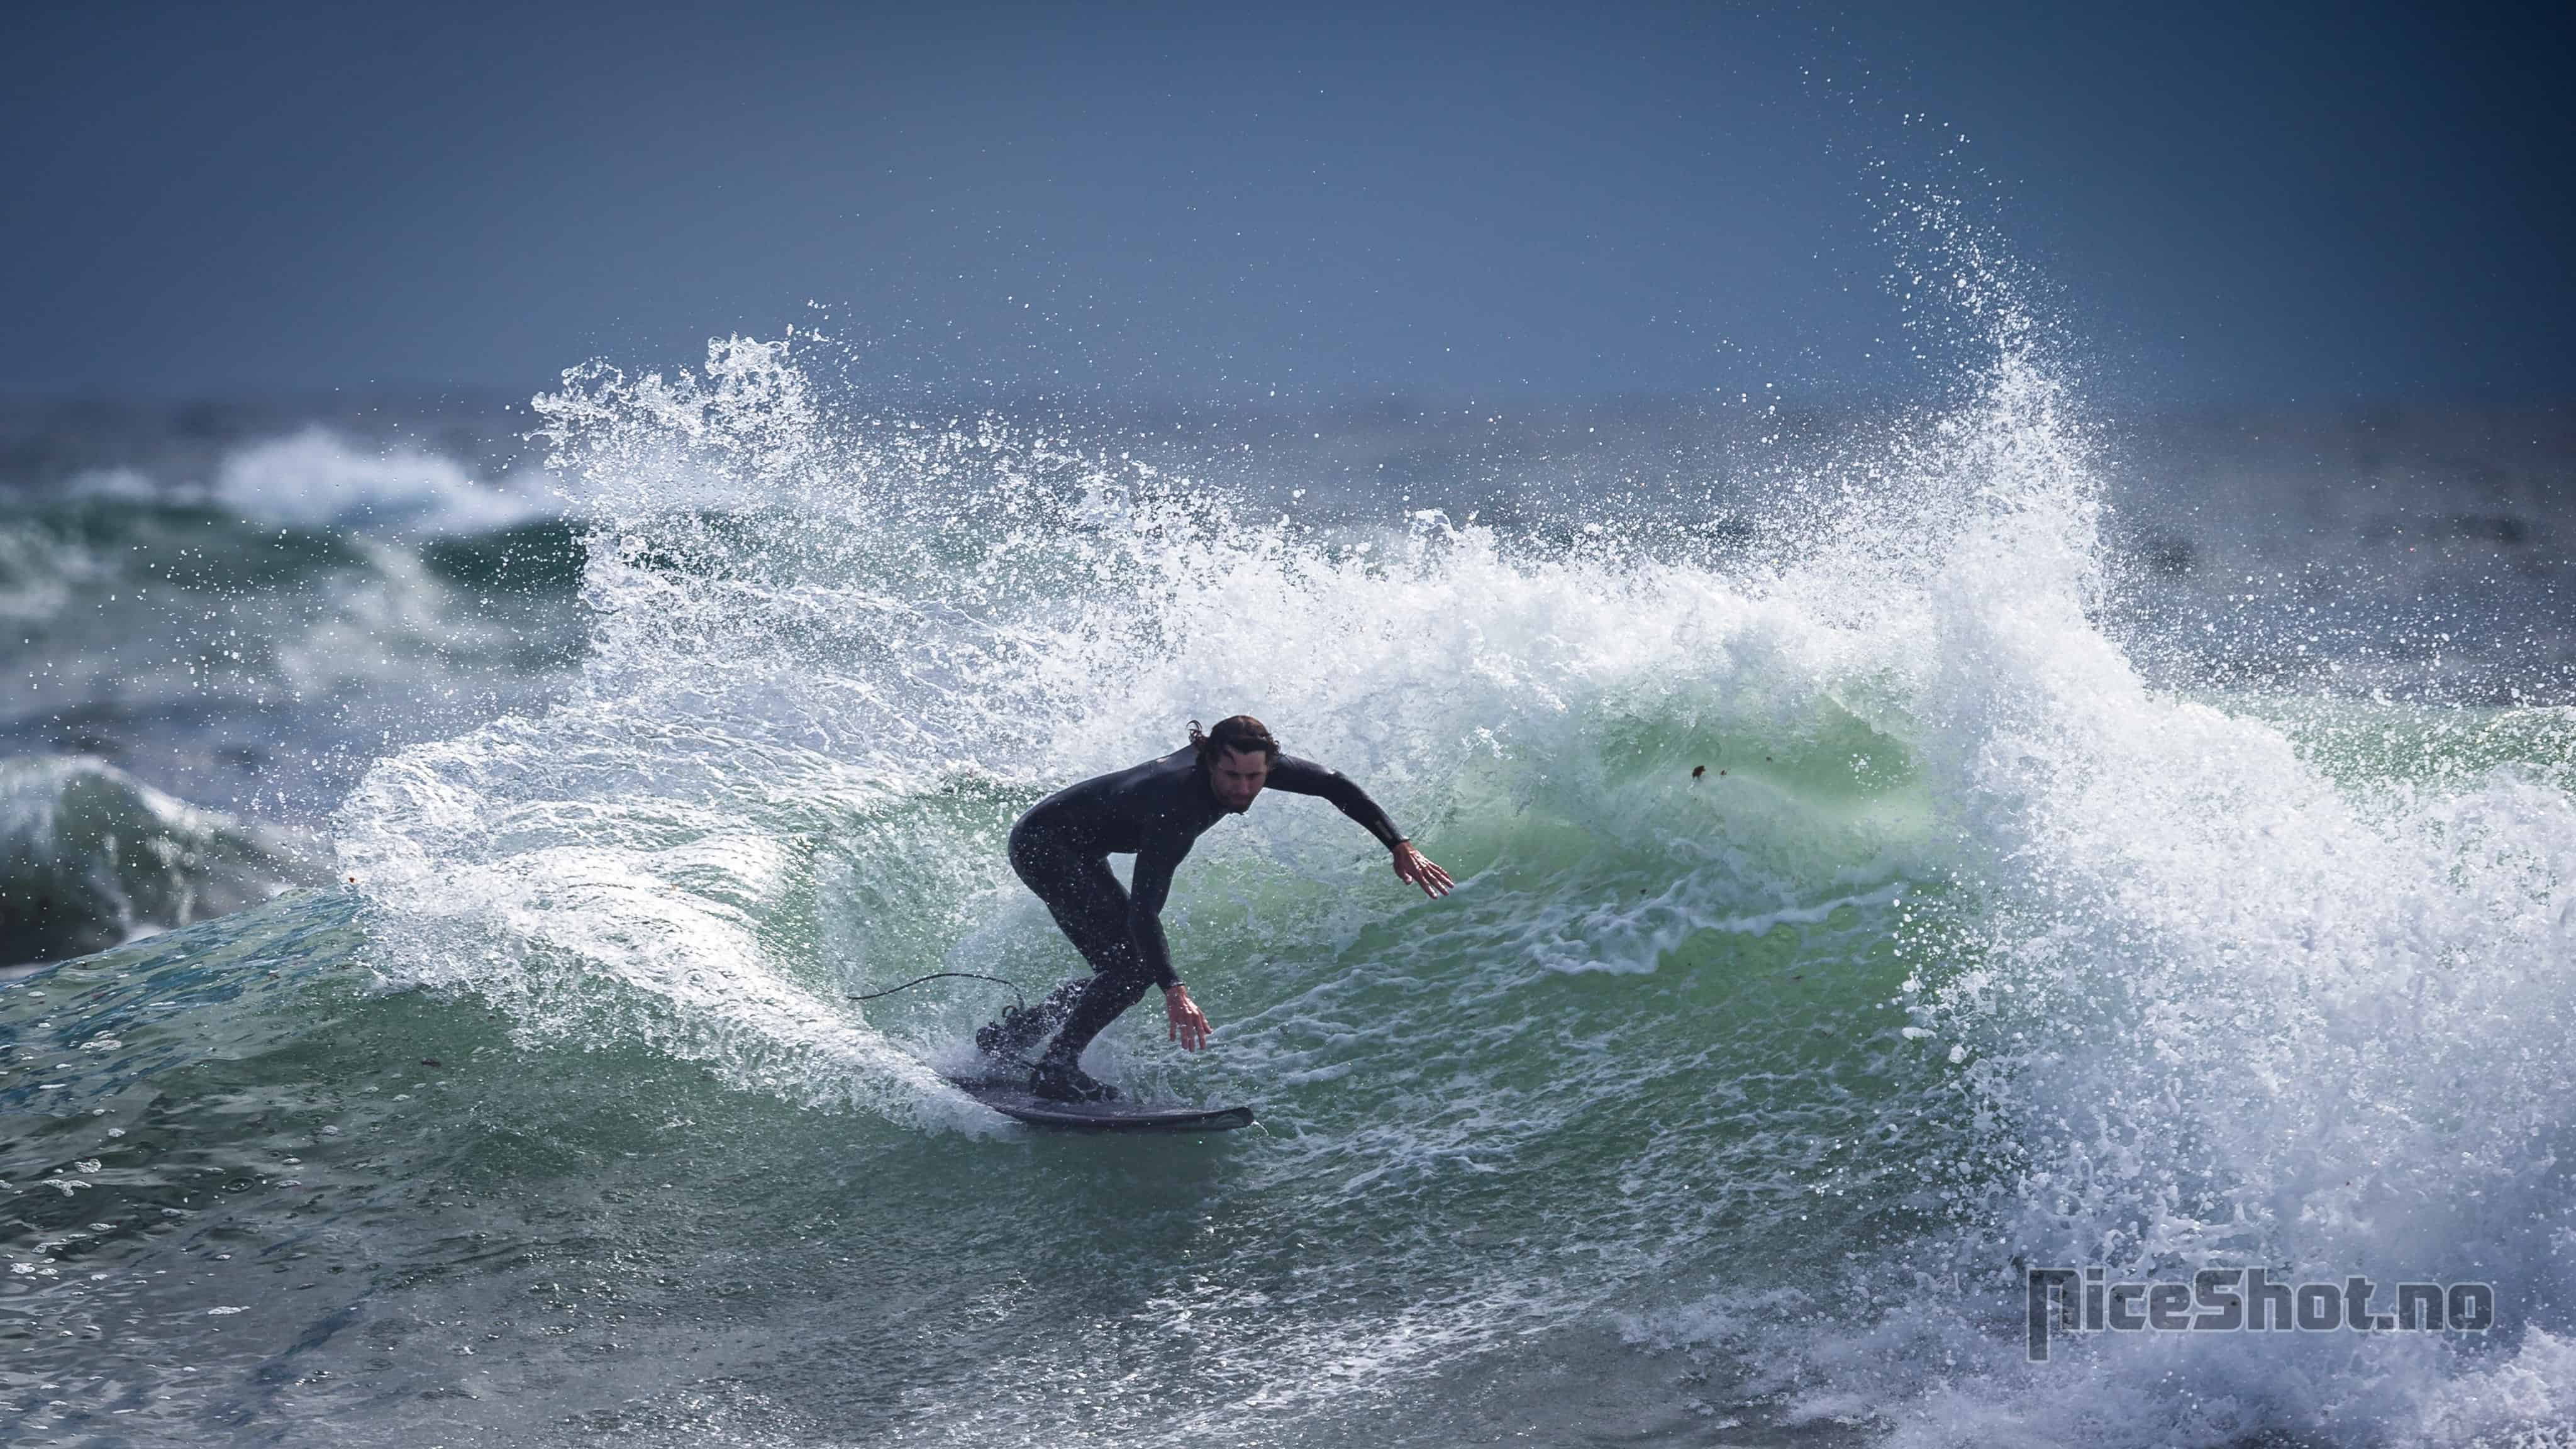 Joachim Nyhaugen på ferie i sør. Foto: Tom Ivar Arntsen @NiceShot.no